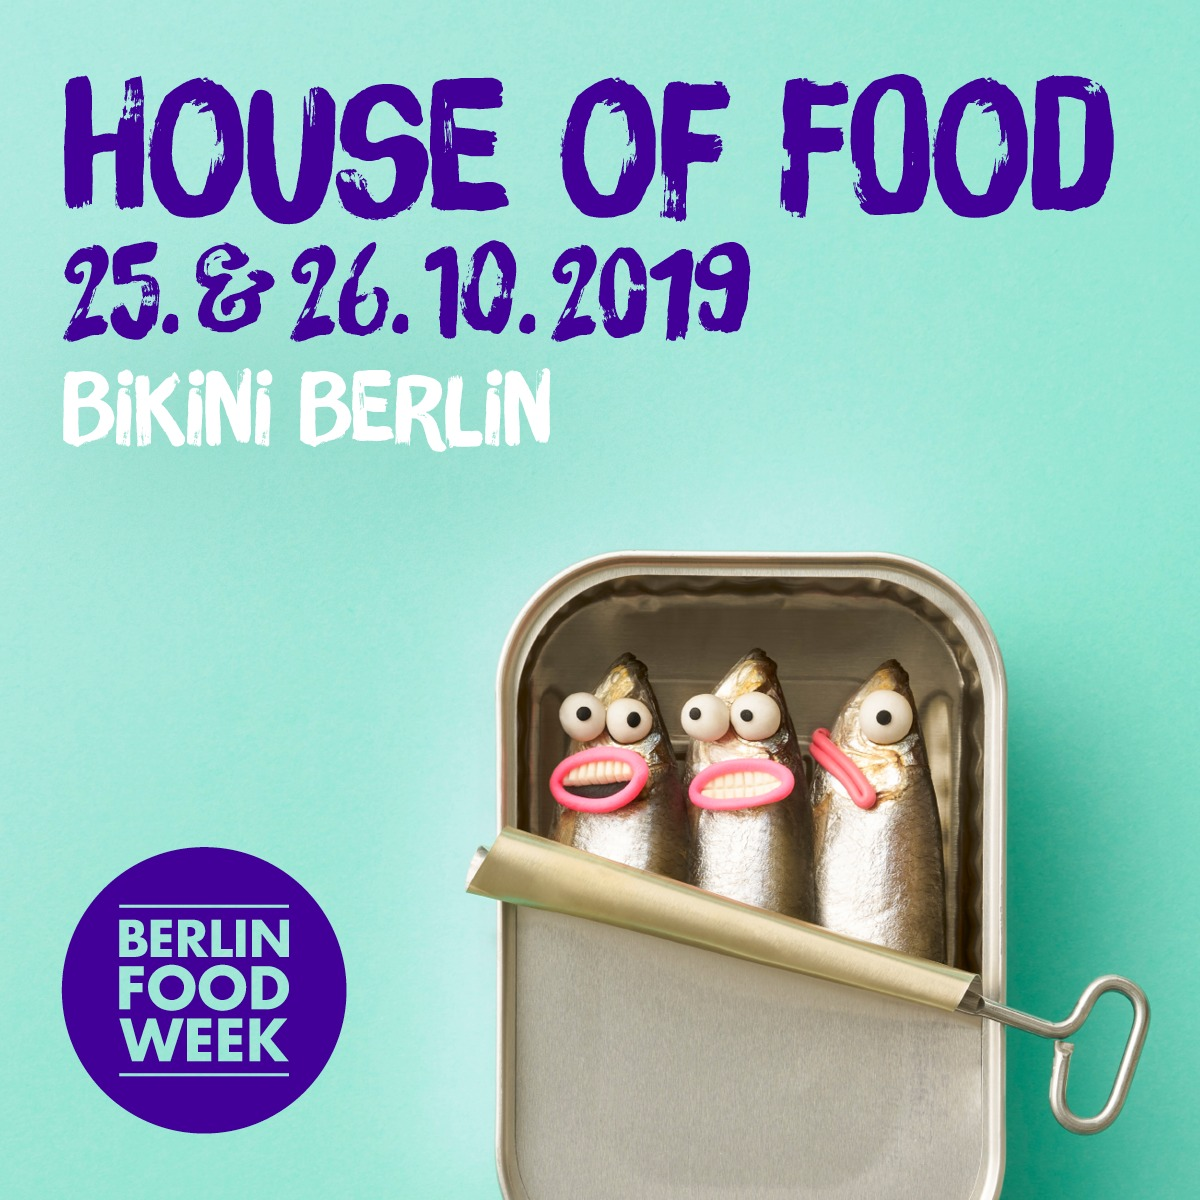 House of Food im Bikin Berlin